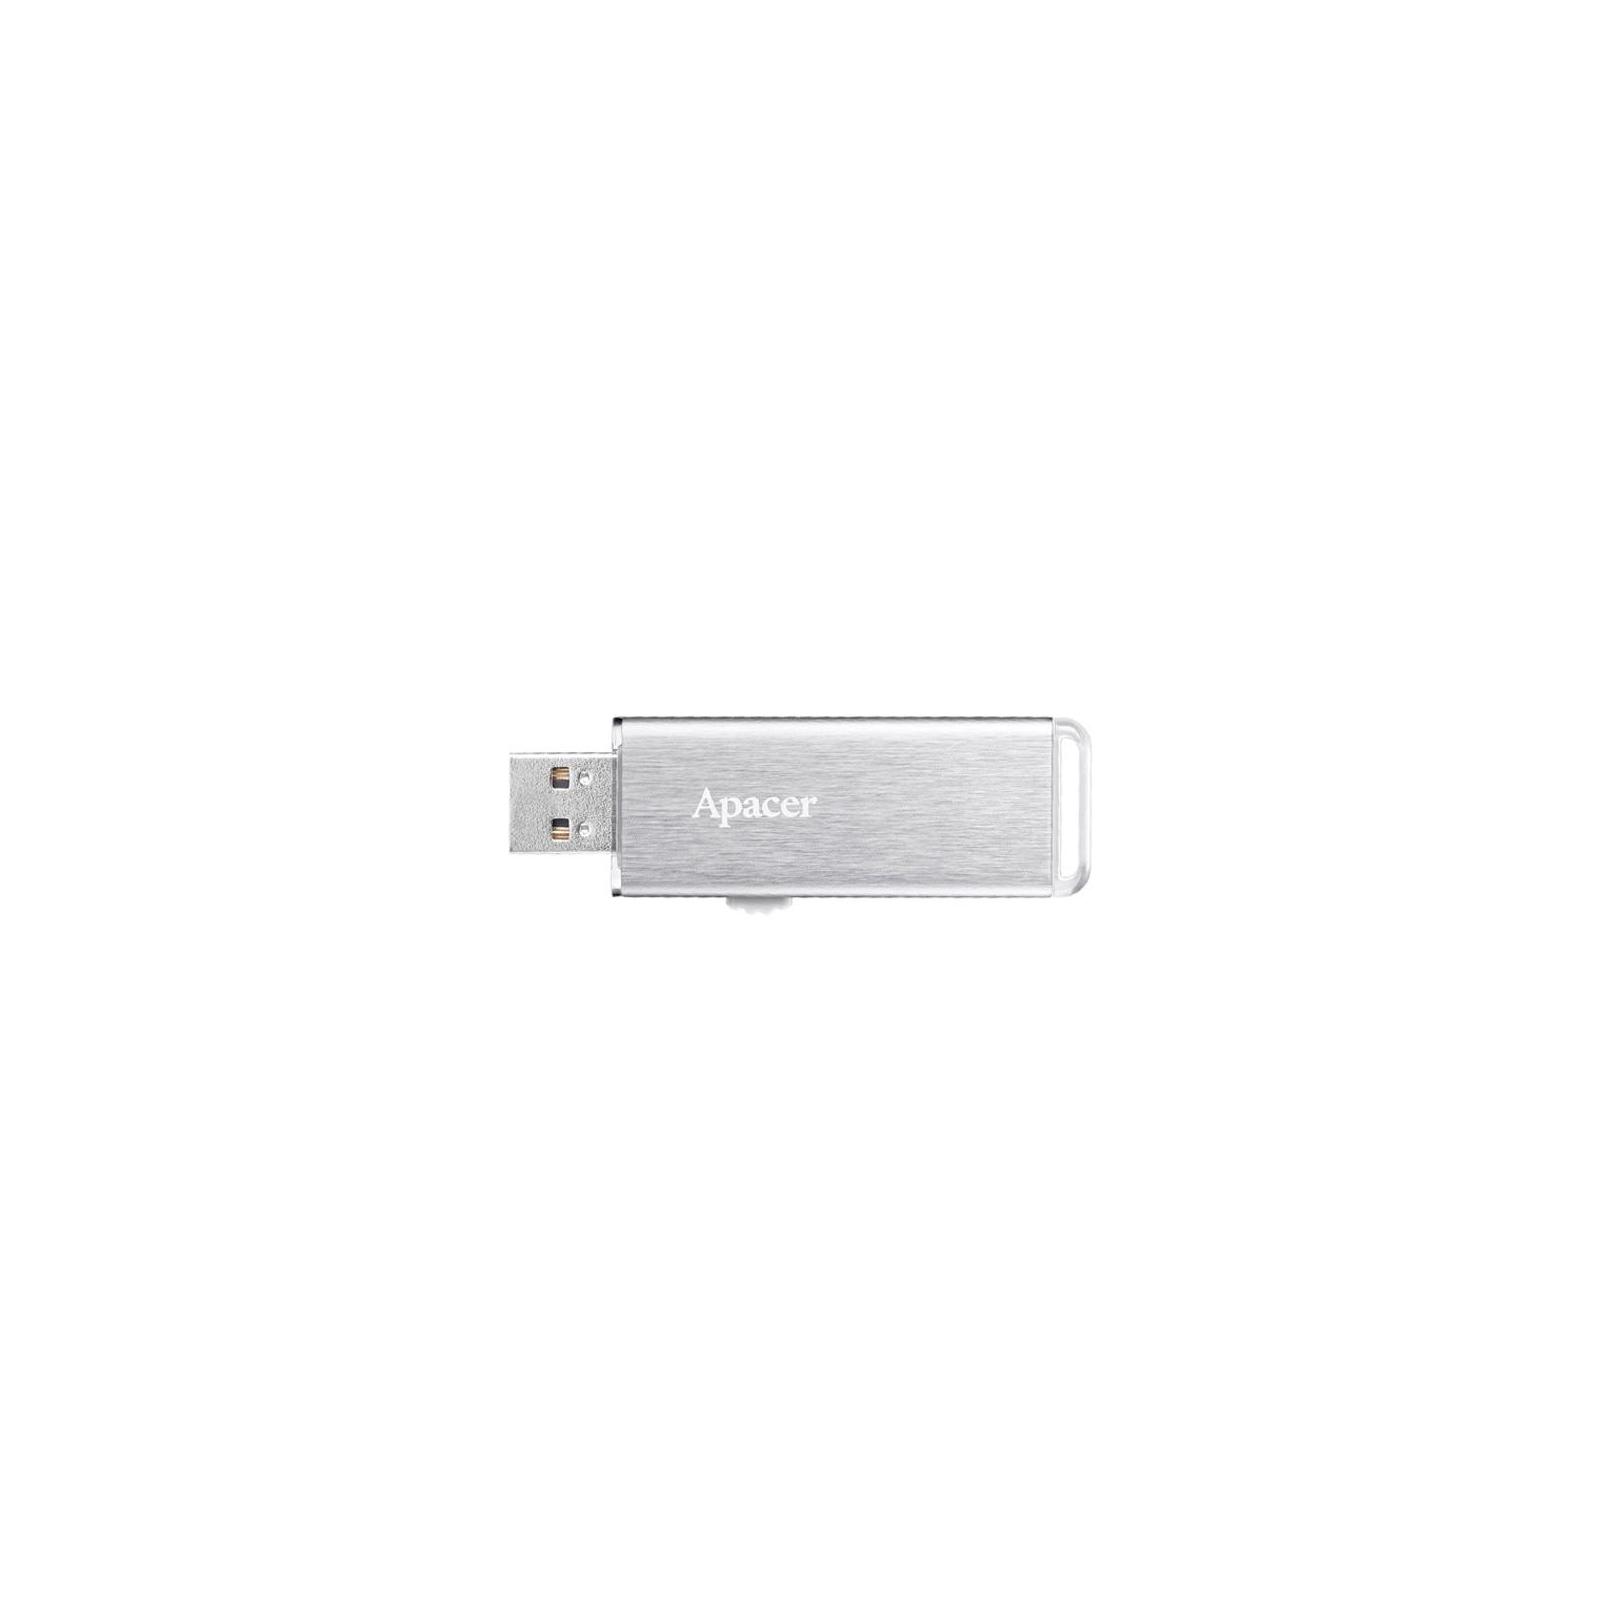 USB флеш накопитель Apacer 64GB AH33A Silver USB 2.0 (AP64GAH33AS-1) изображение 2